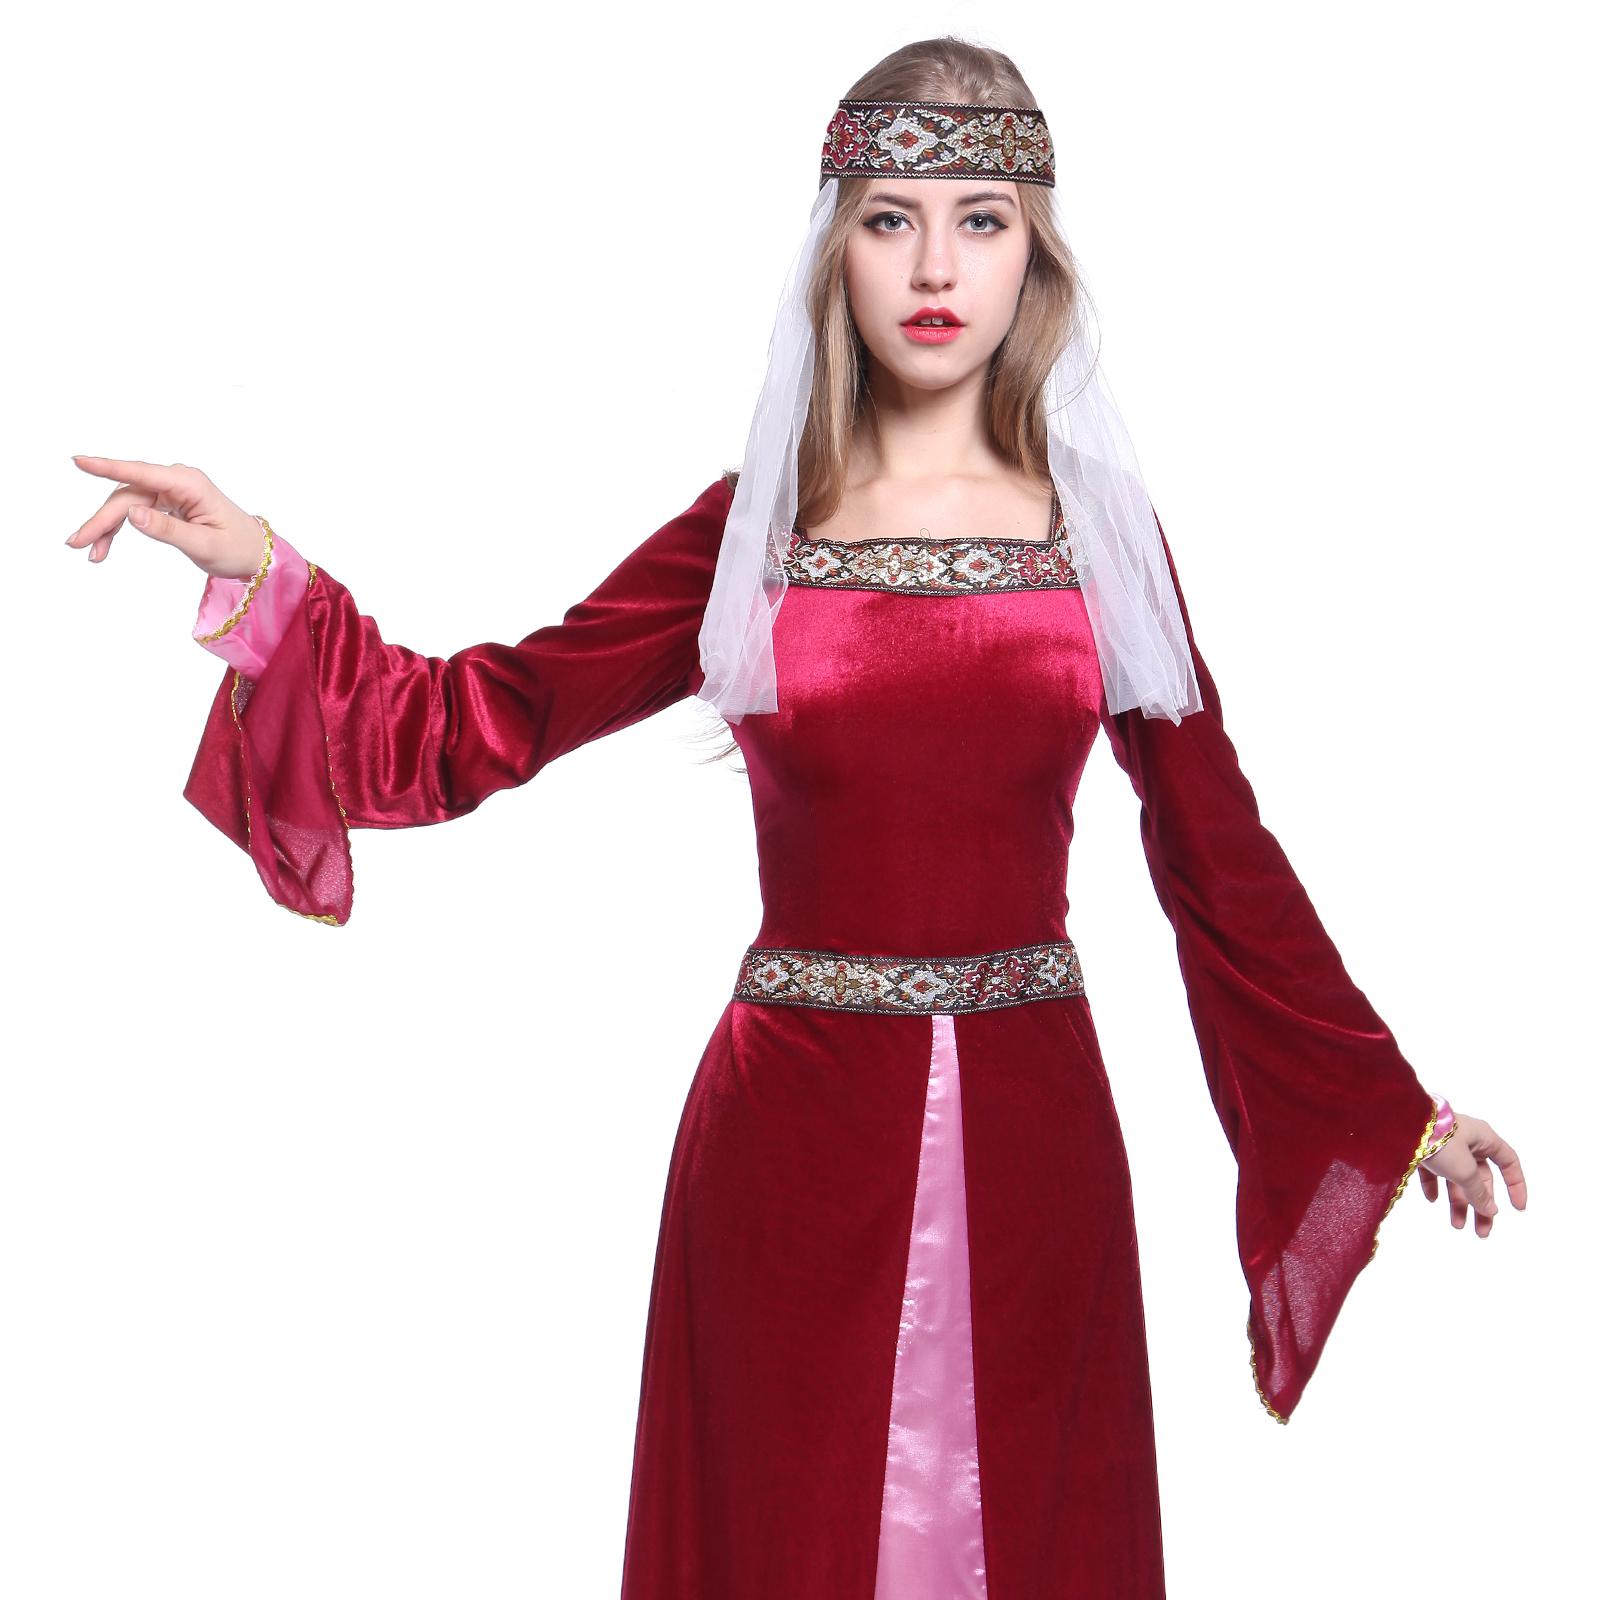 maid marian marion magd robin hood heldin der w lder burgfr ulein tudor kost m ebay. Black Bedroom Furniture Sets. Home Design Ideas